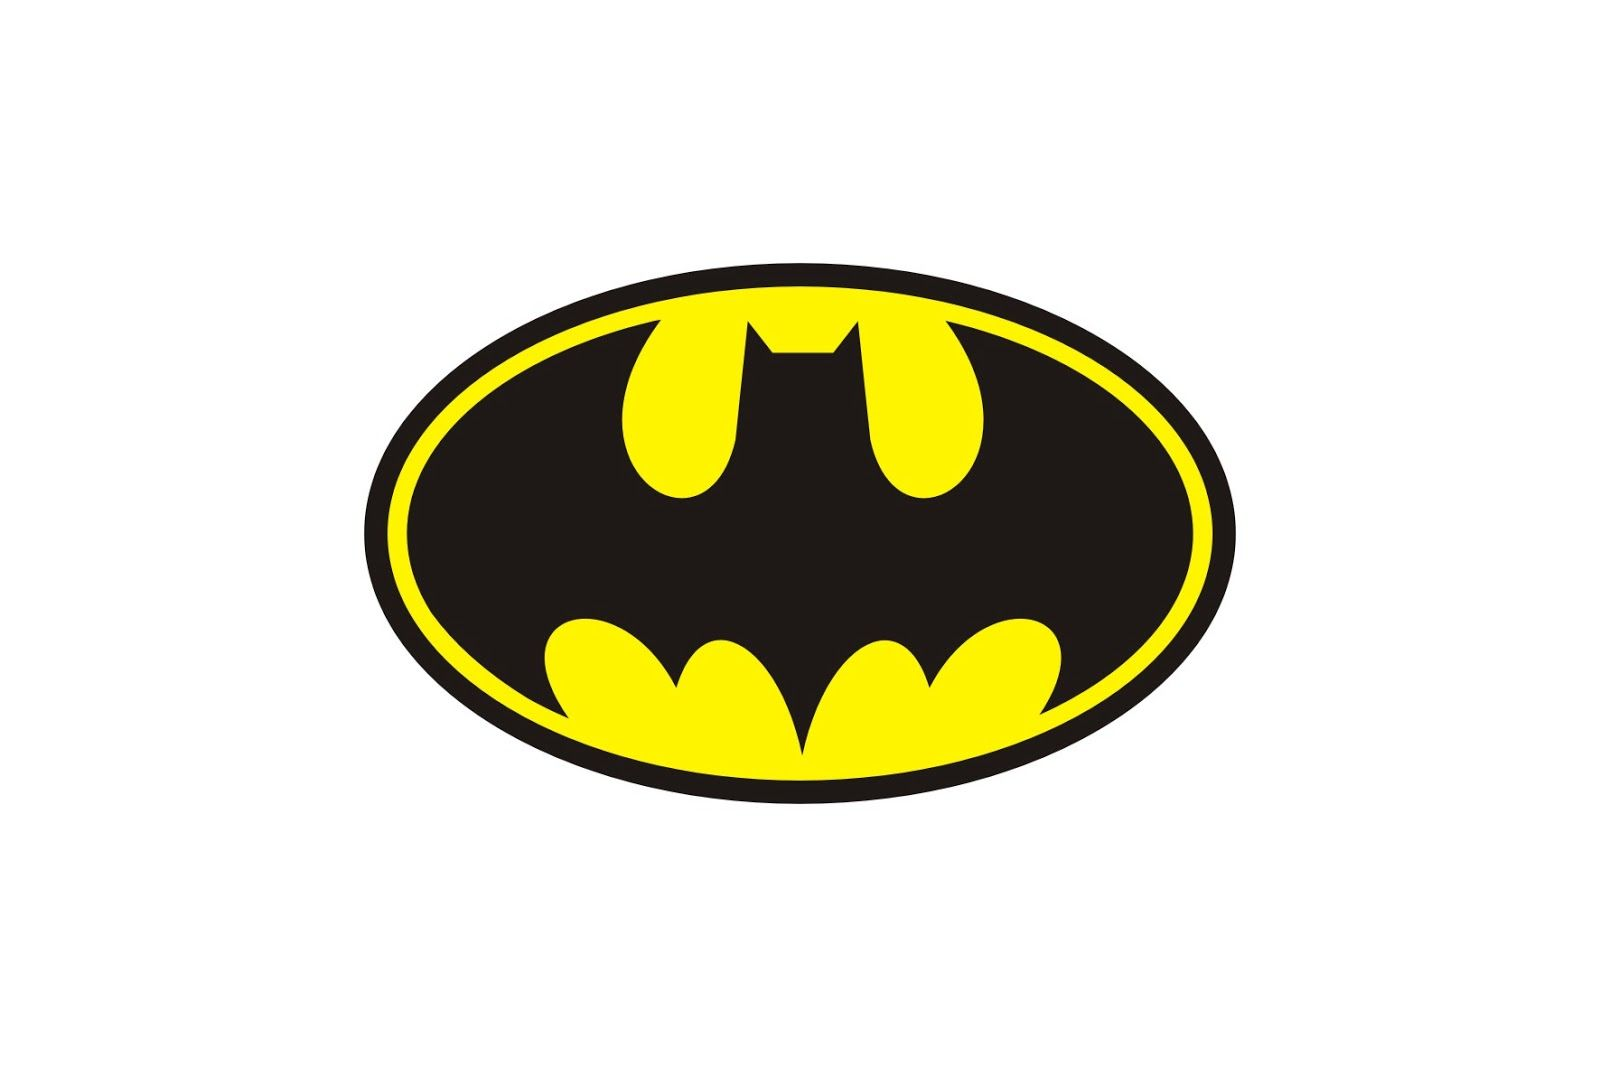 Batman logo clipart template image freeuse library Batman Logo Printable - ClipArt Best | School stuff in 2019 ... image freeuse library